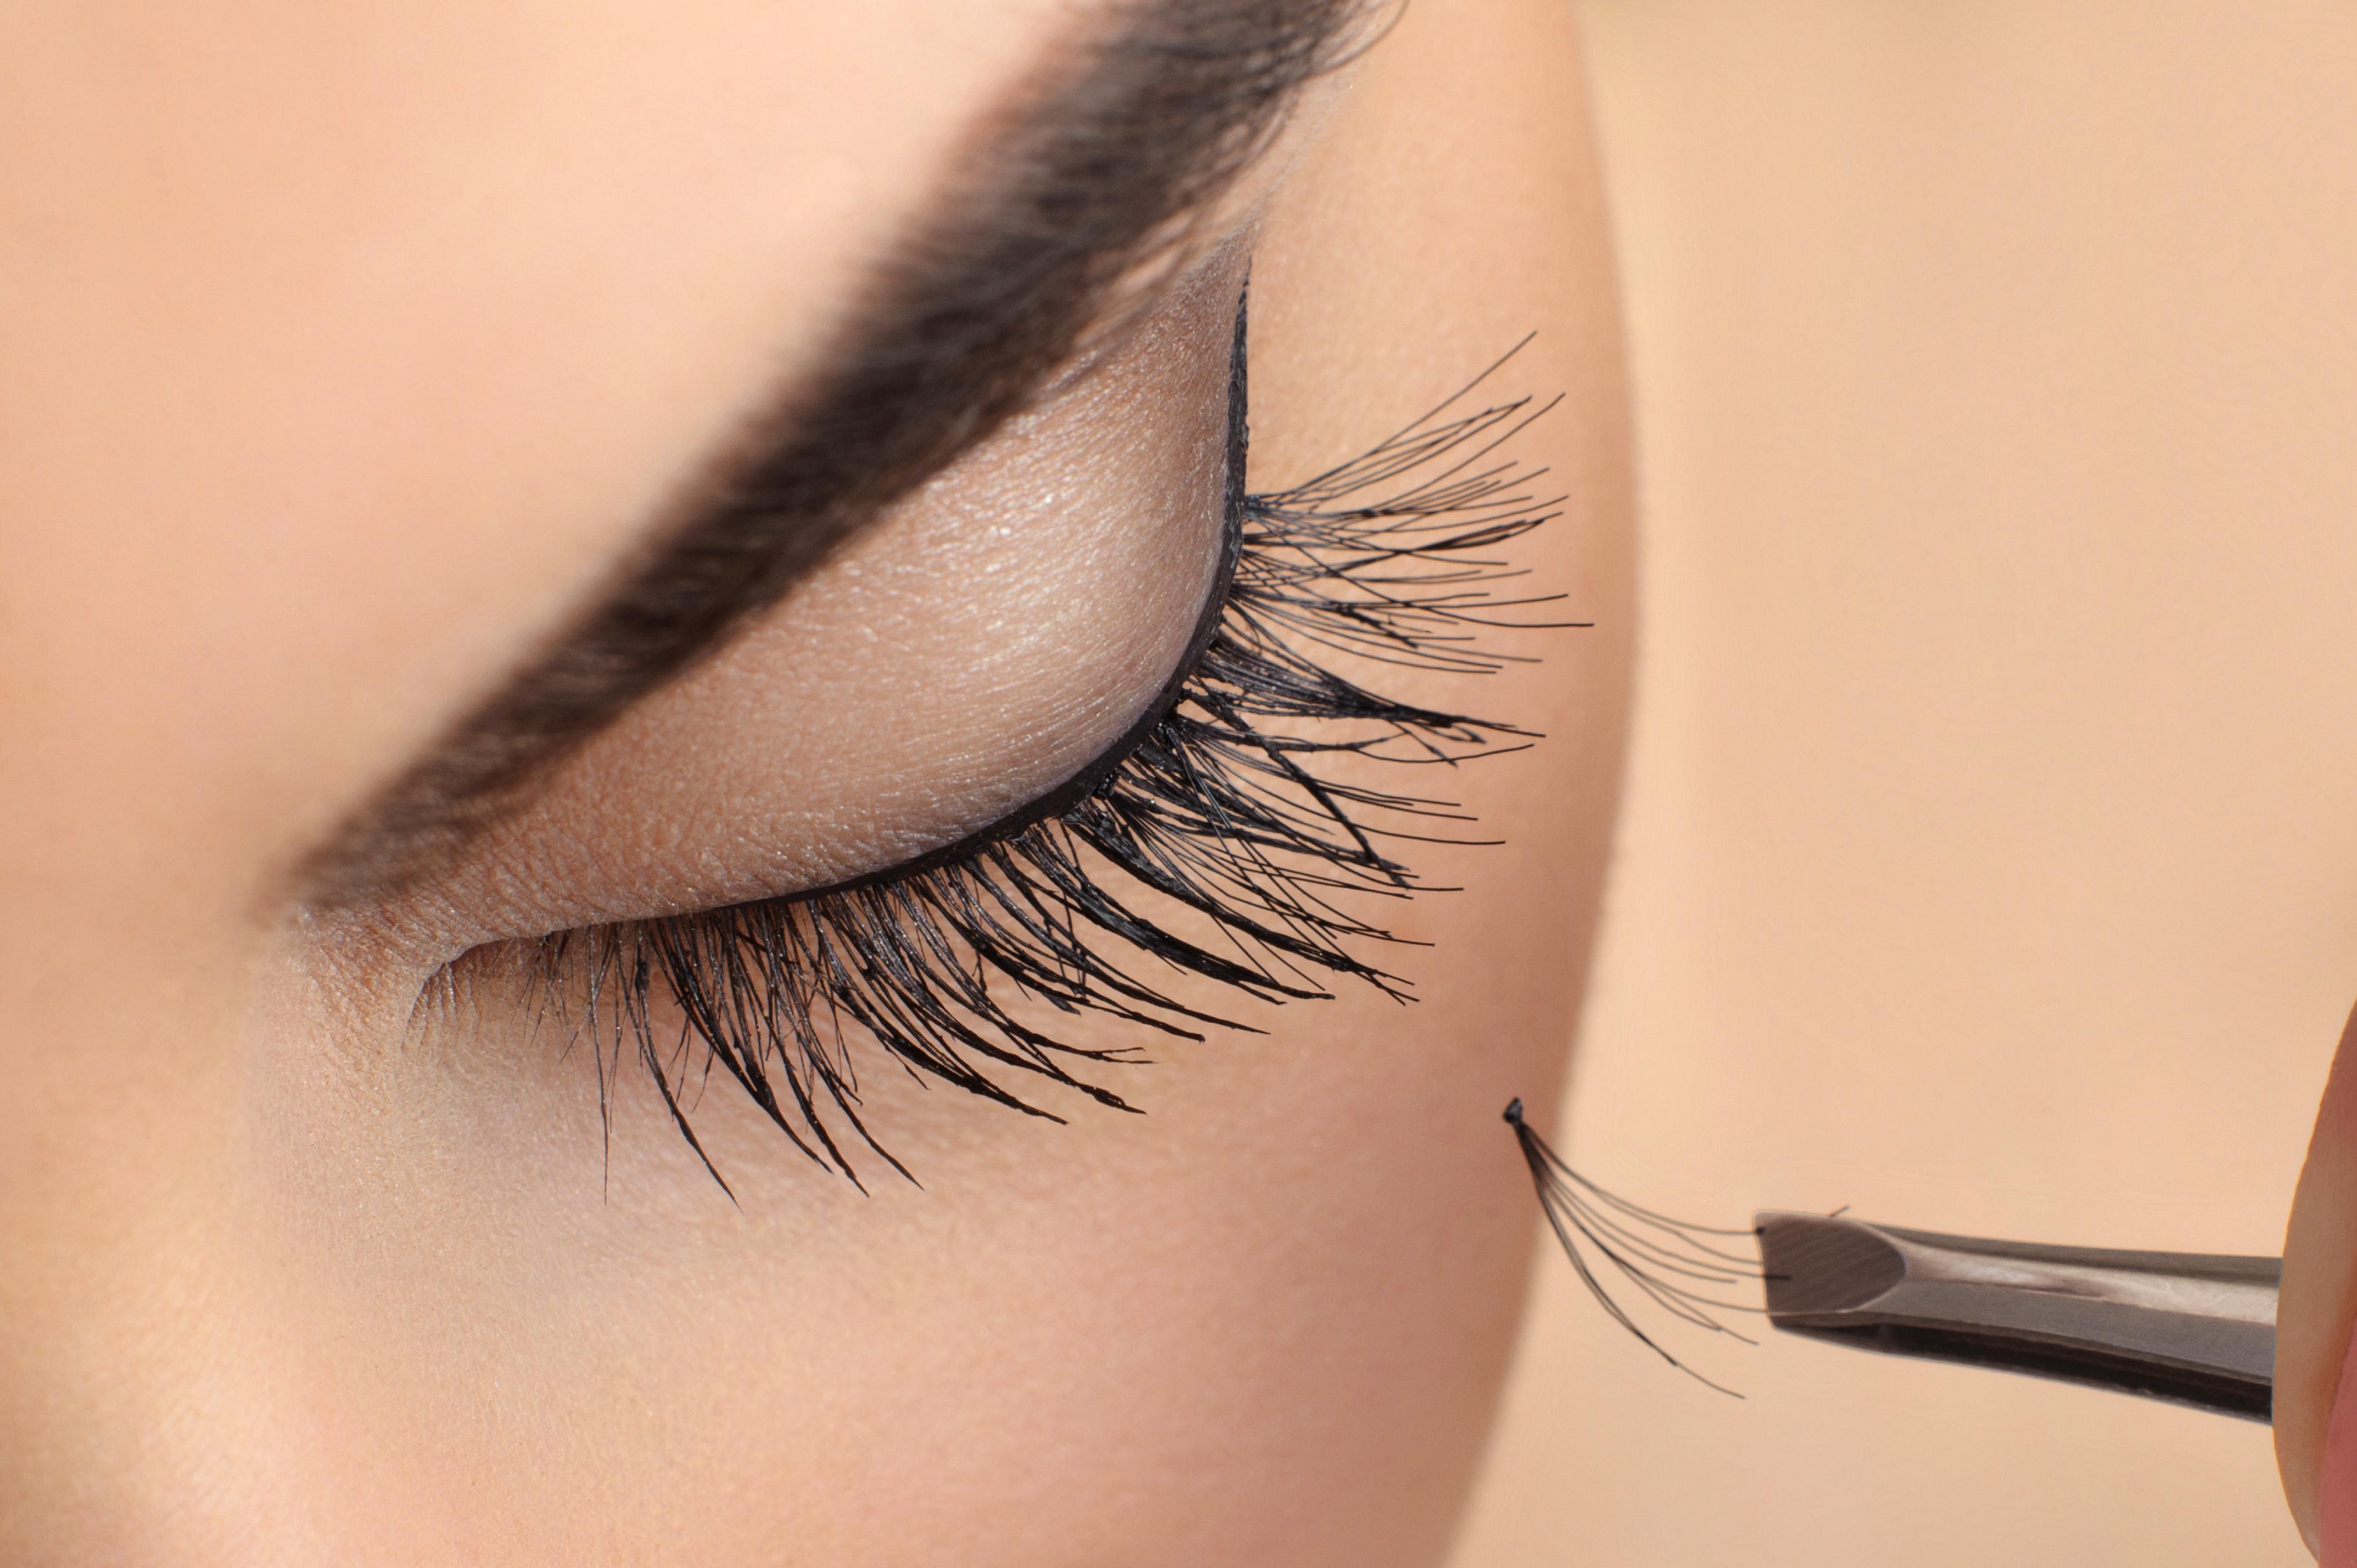 pestañas postizas, consejos, beauty tips,